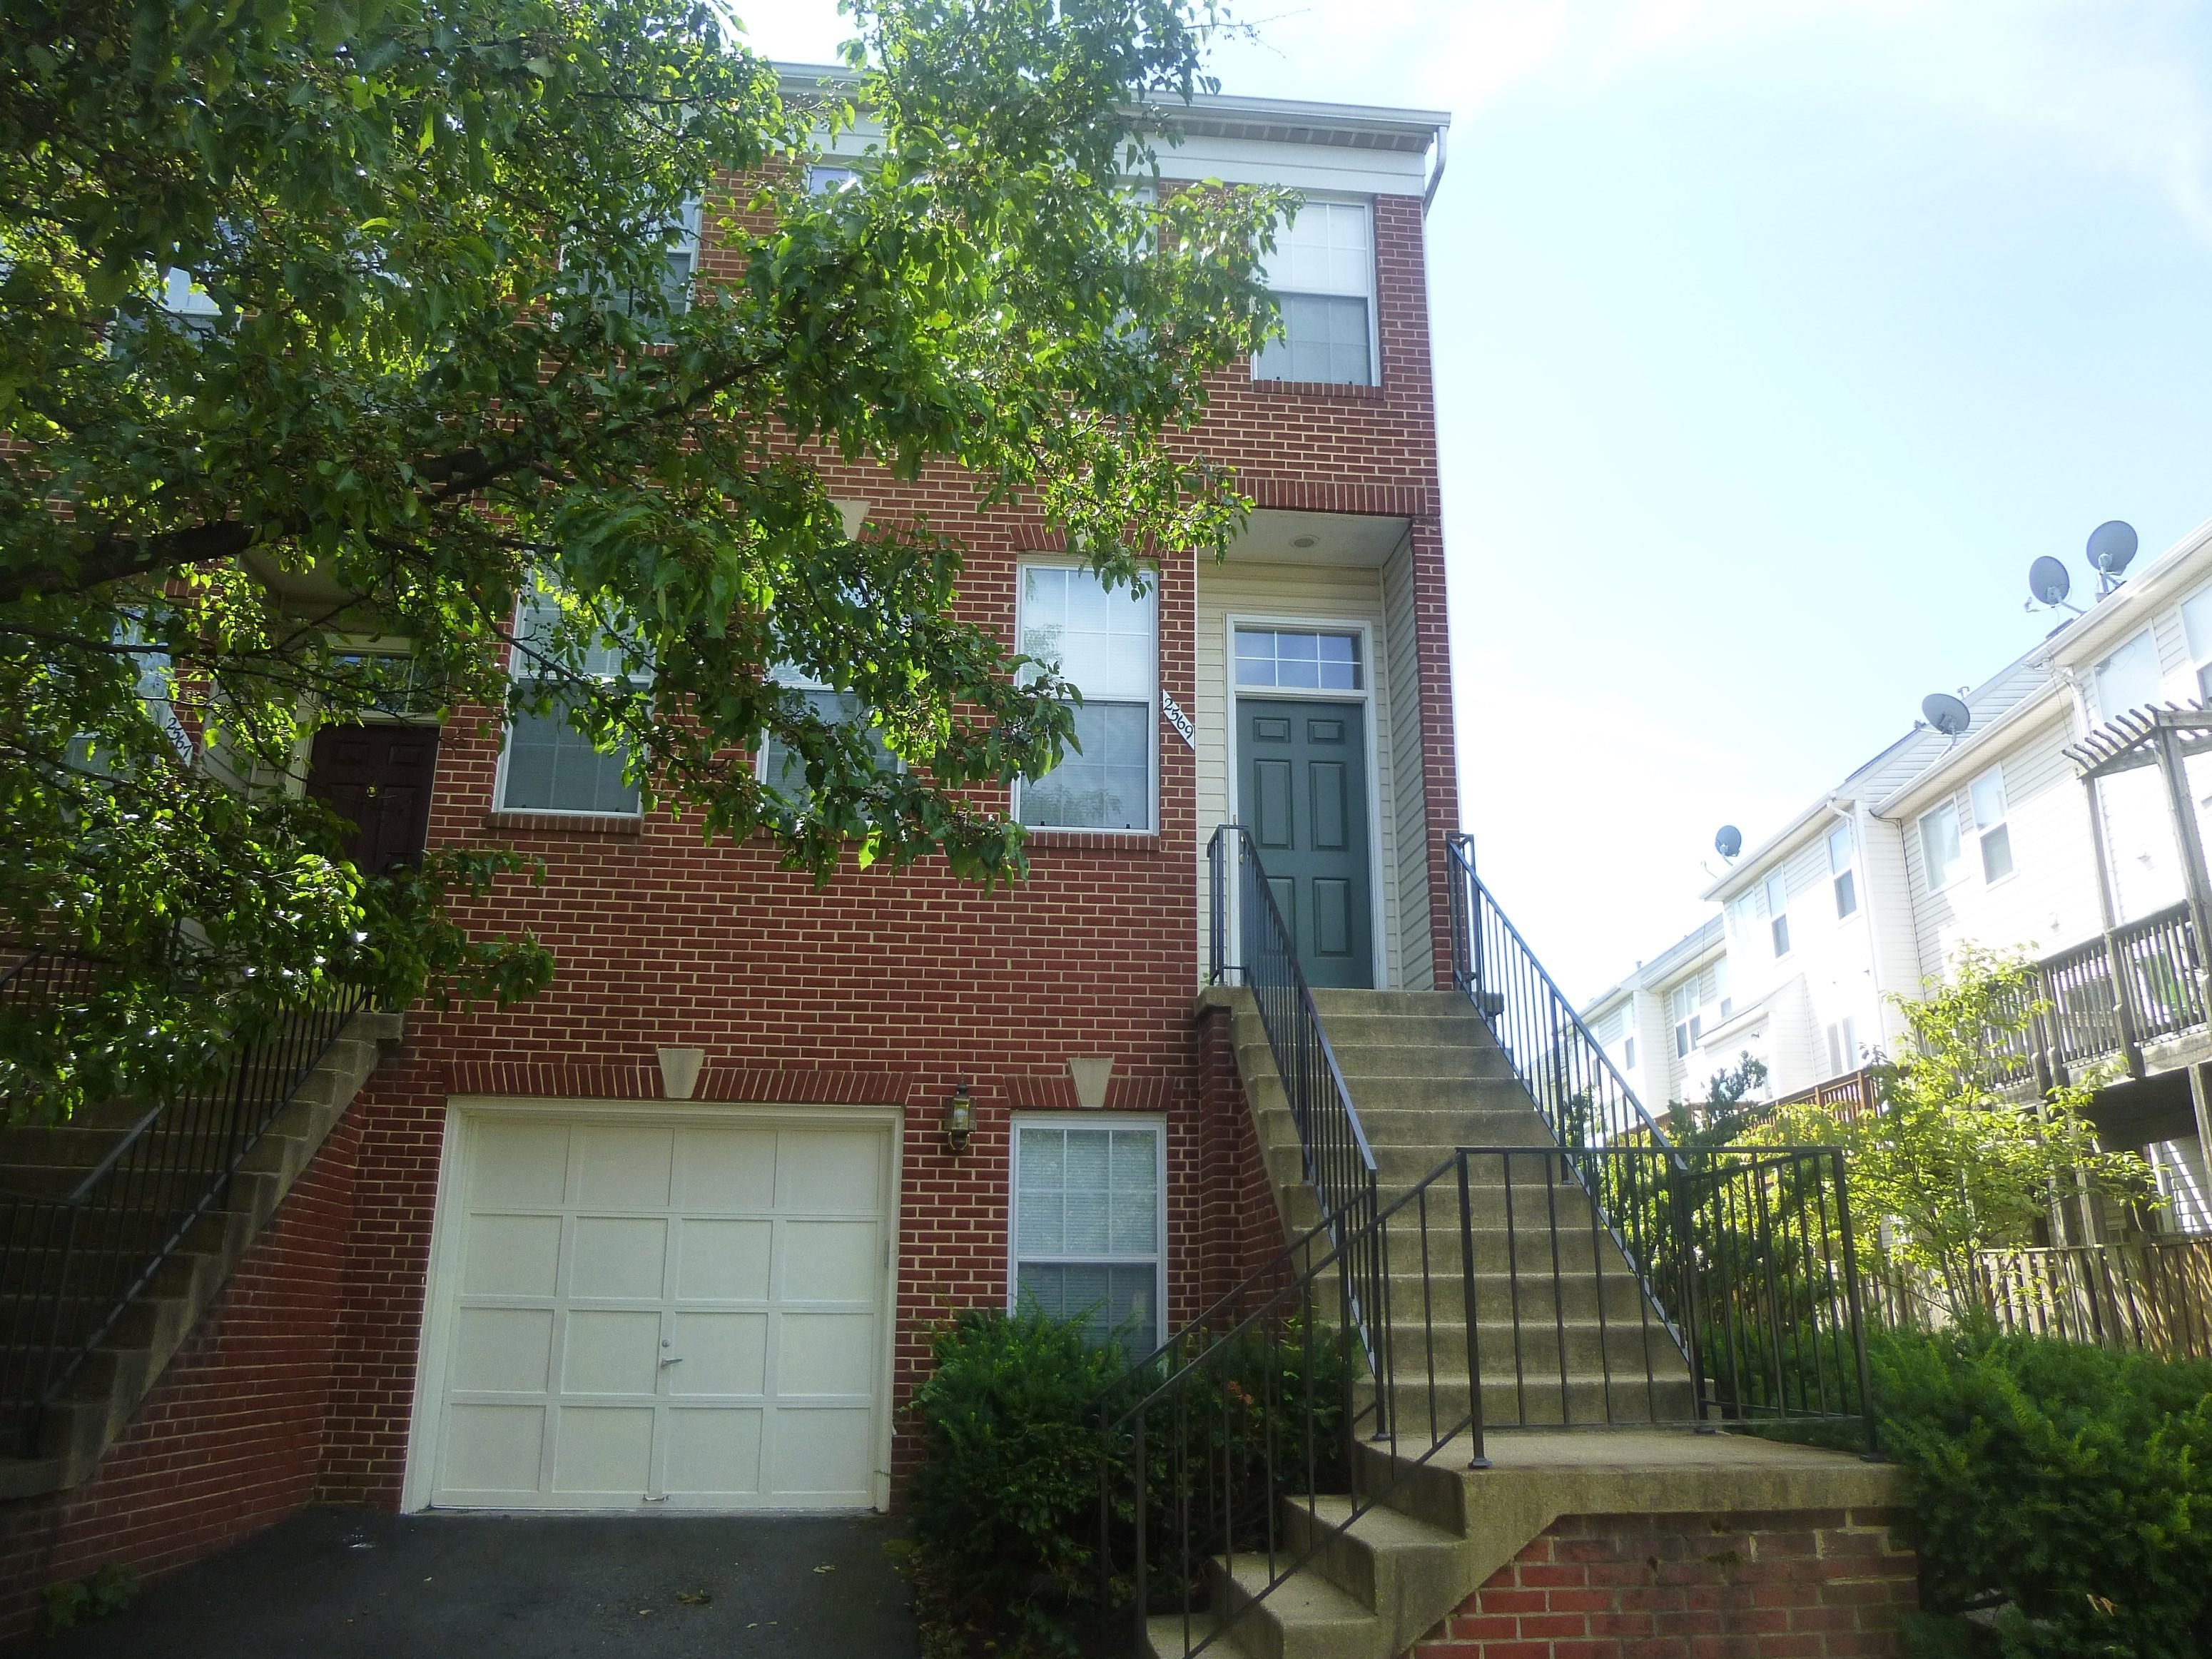 Basement Apartments For Rent In Fairfax Va